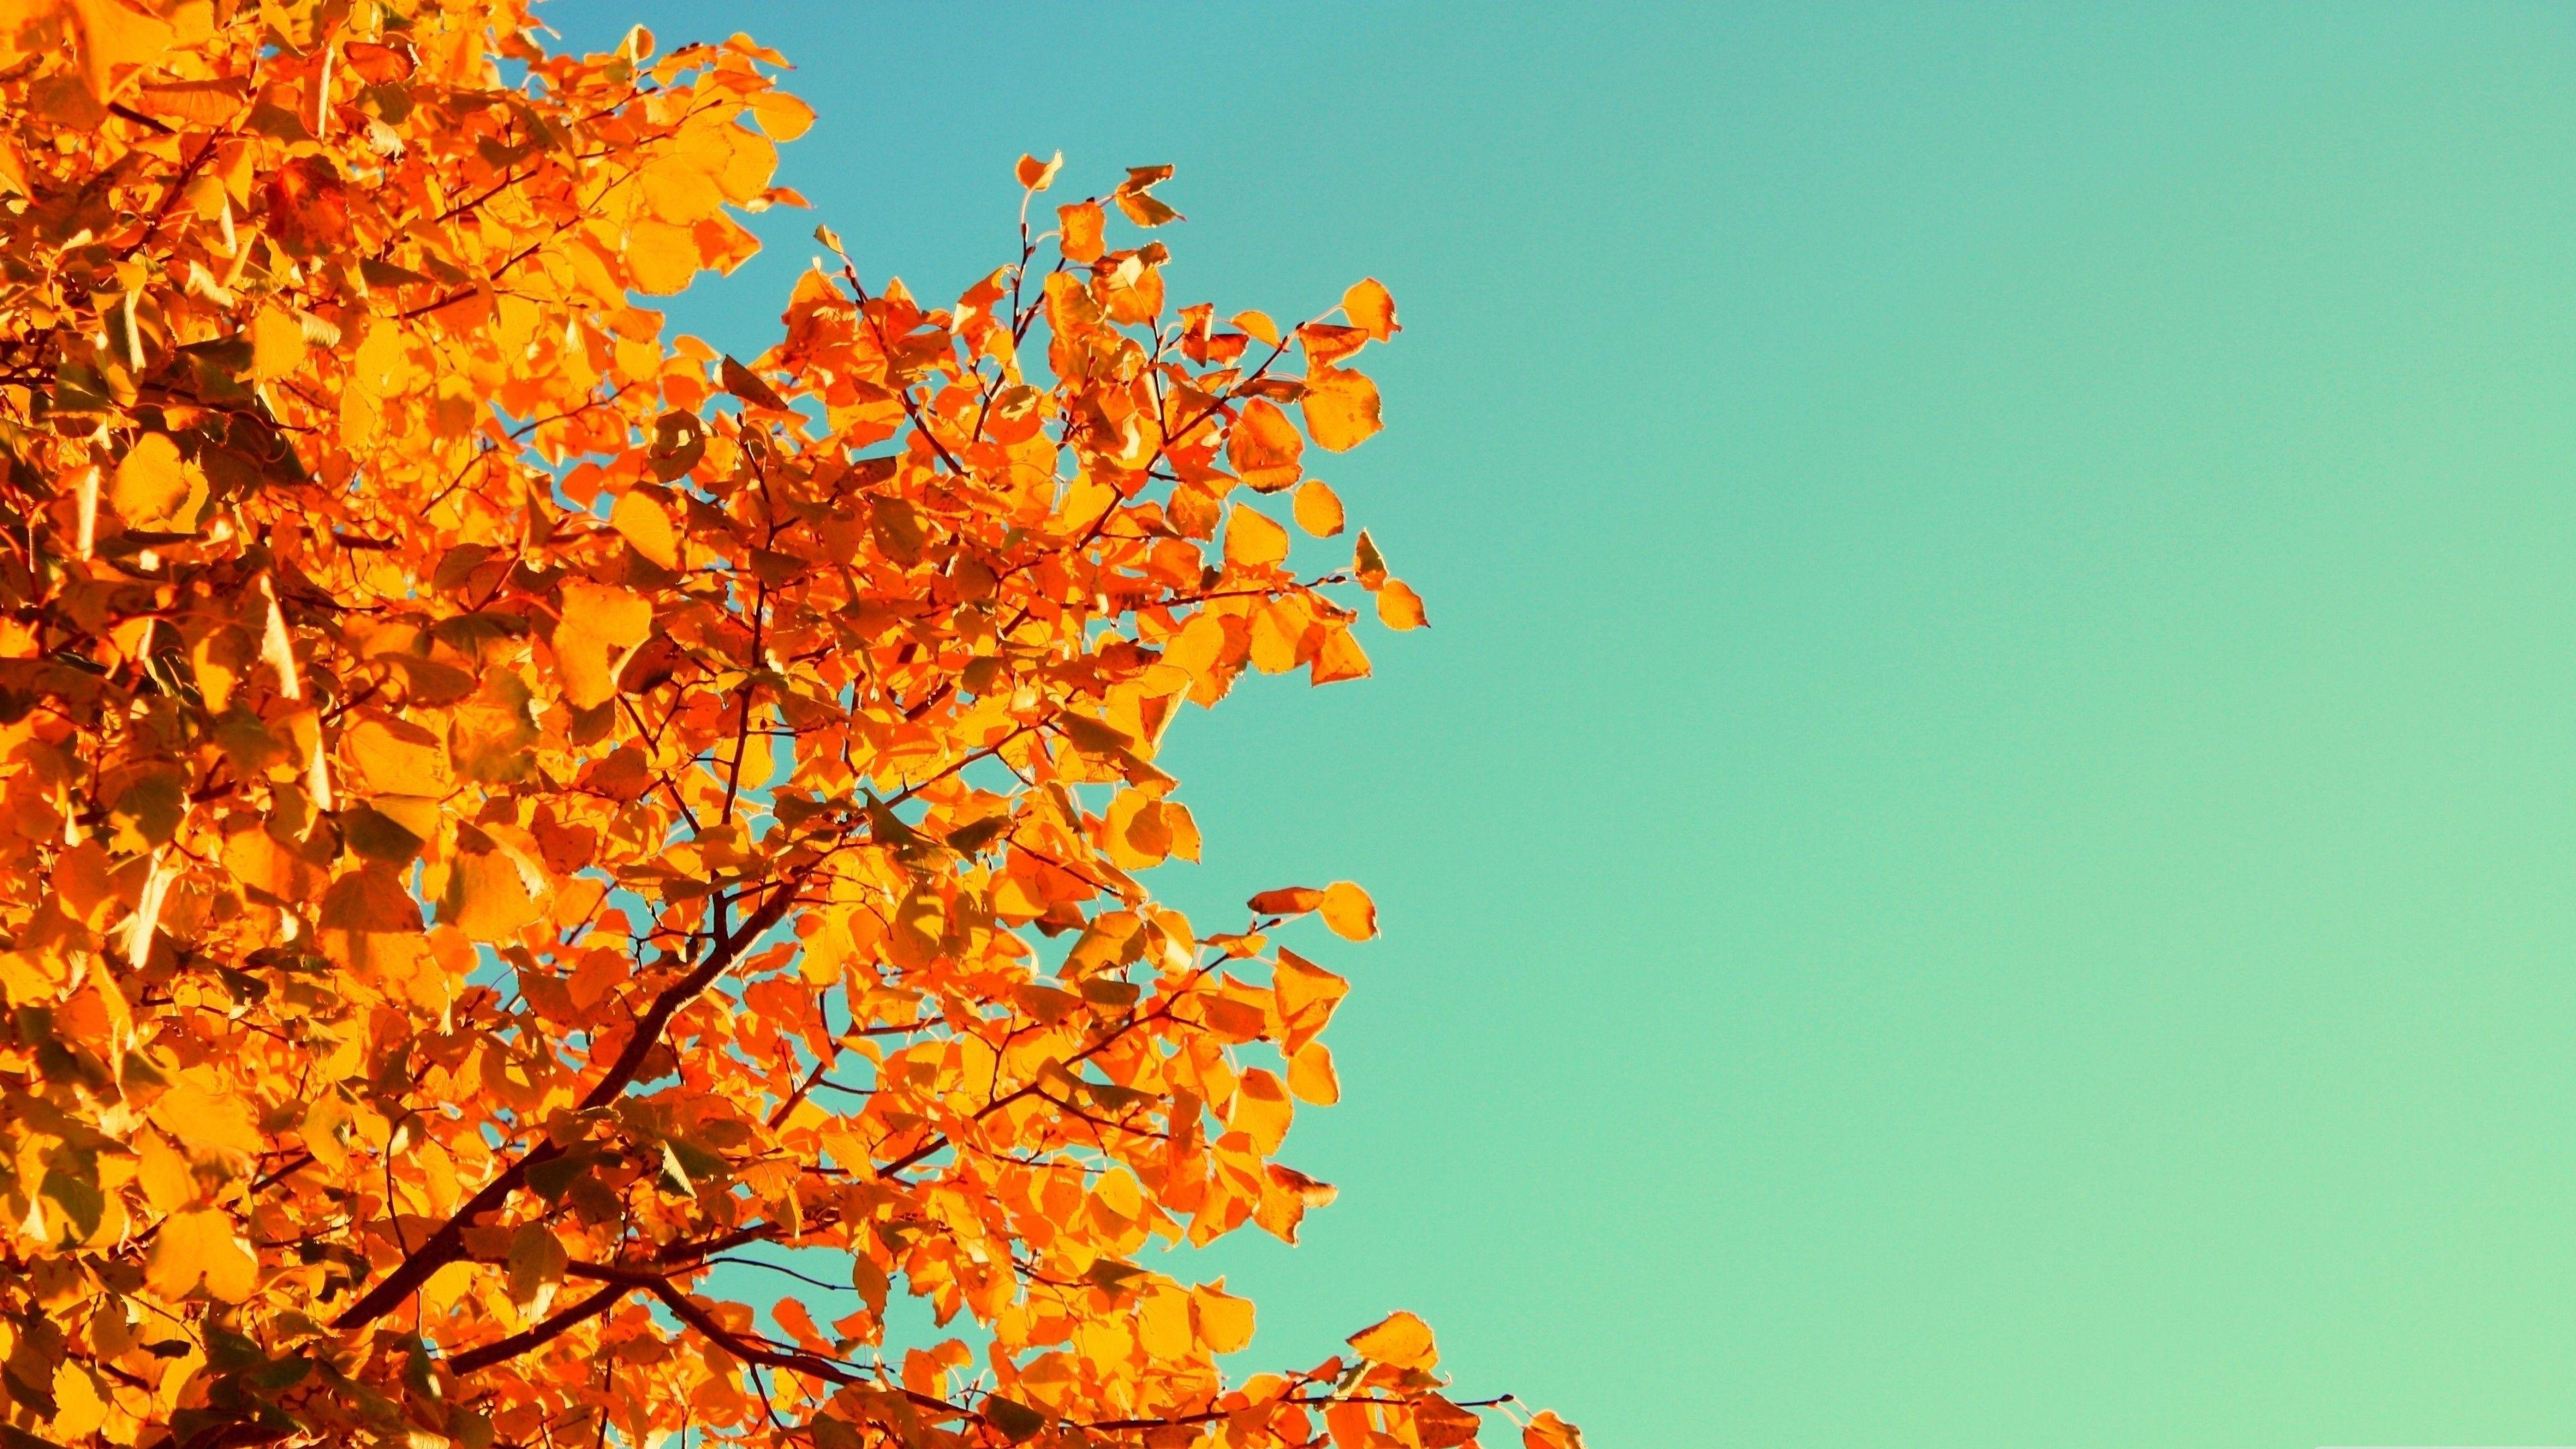 3840 X 2160 Autumn Wallpapers - Top ...